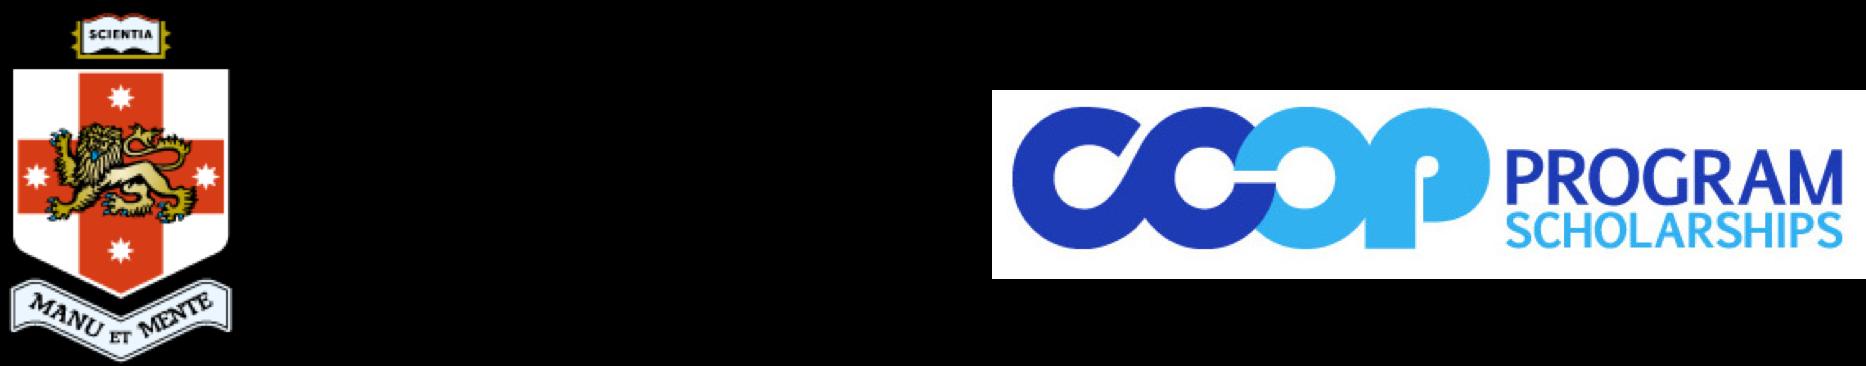 UNSW Co-op Program.png